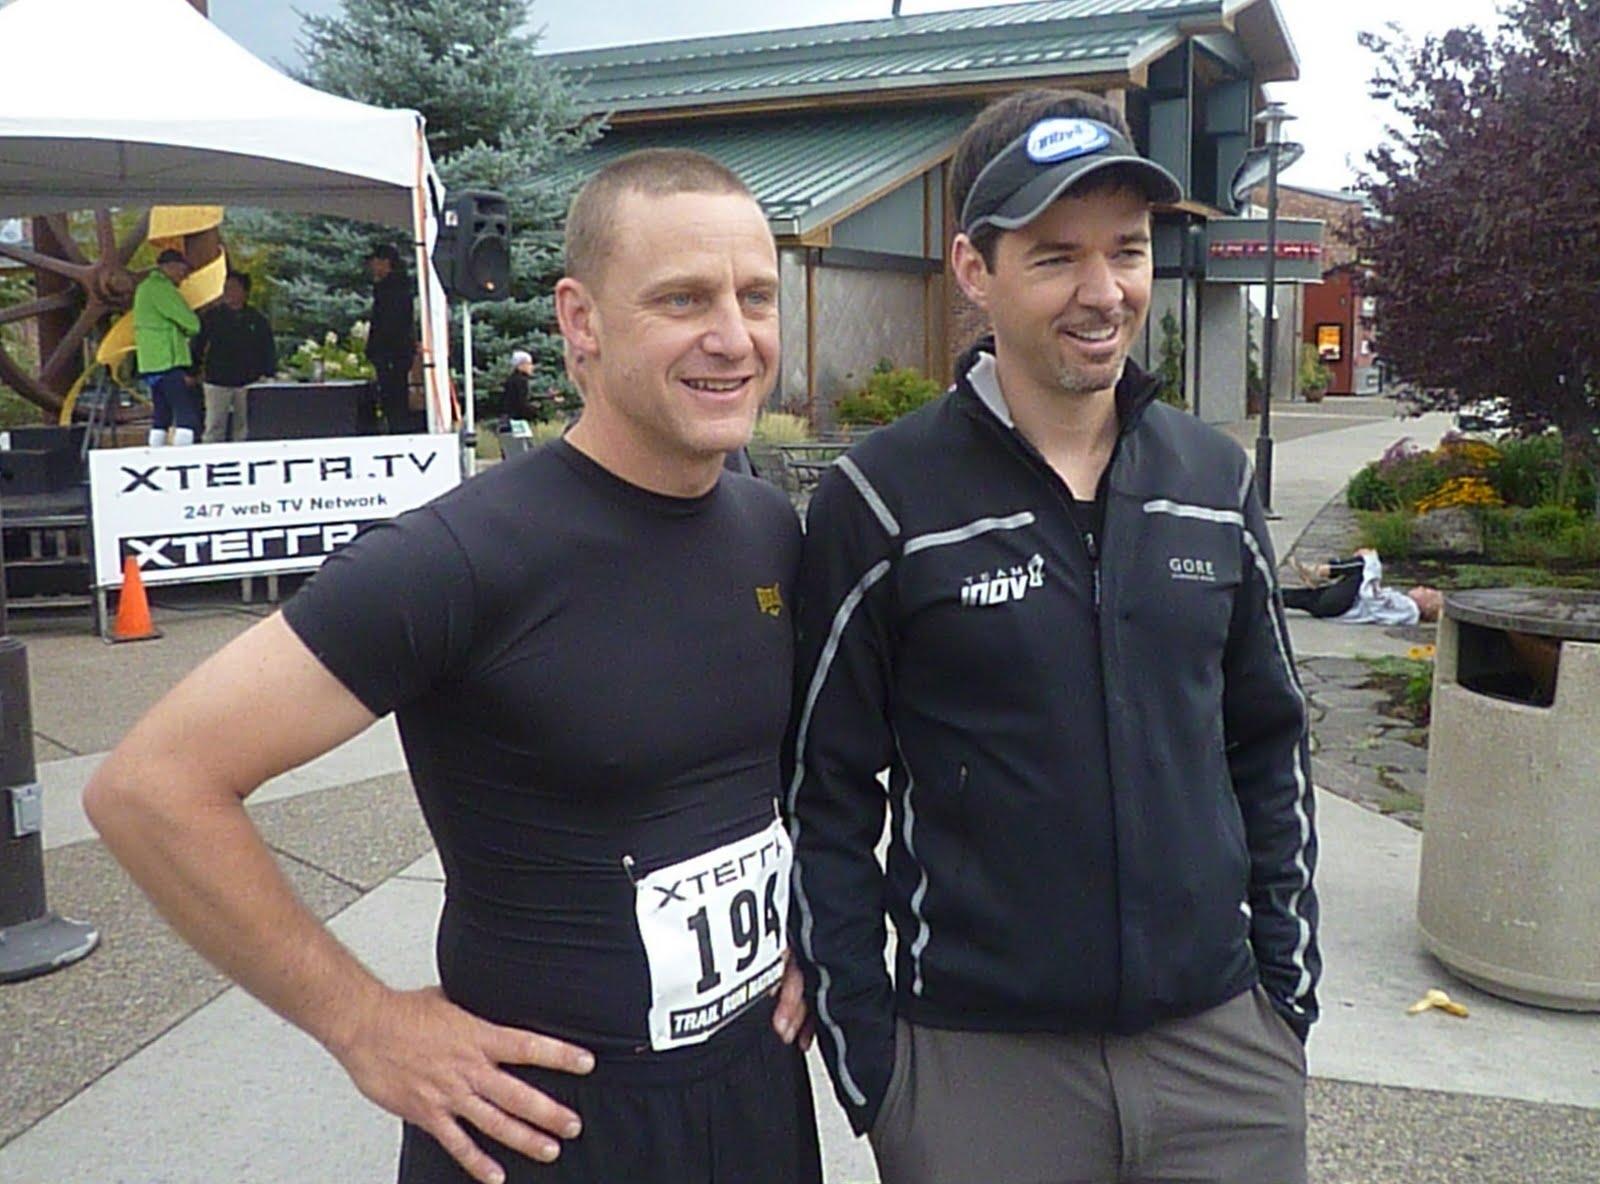 http://3.bp.blogspot.com/_E1tEsdn7gHE/TJkjziKpSWI/AAAAAAAAD_s/9qI83v0ISK4/s1600/2010_xterra_trail_running_nationals+1.jpg